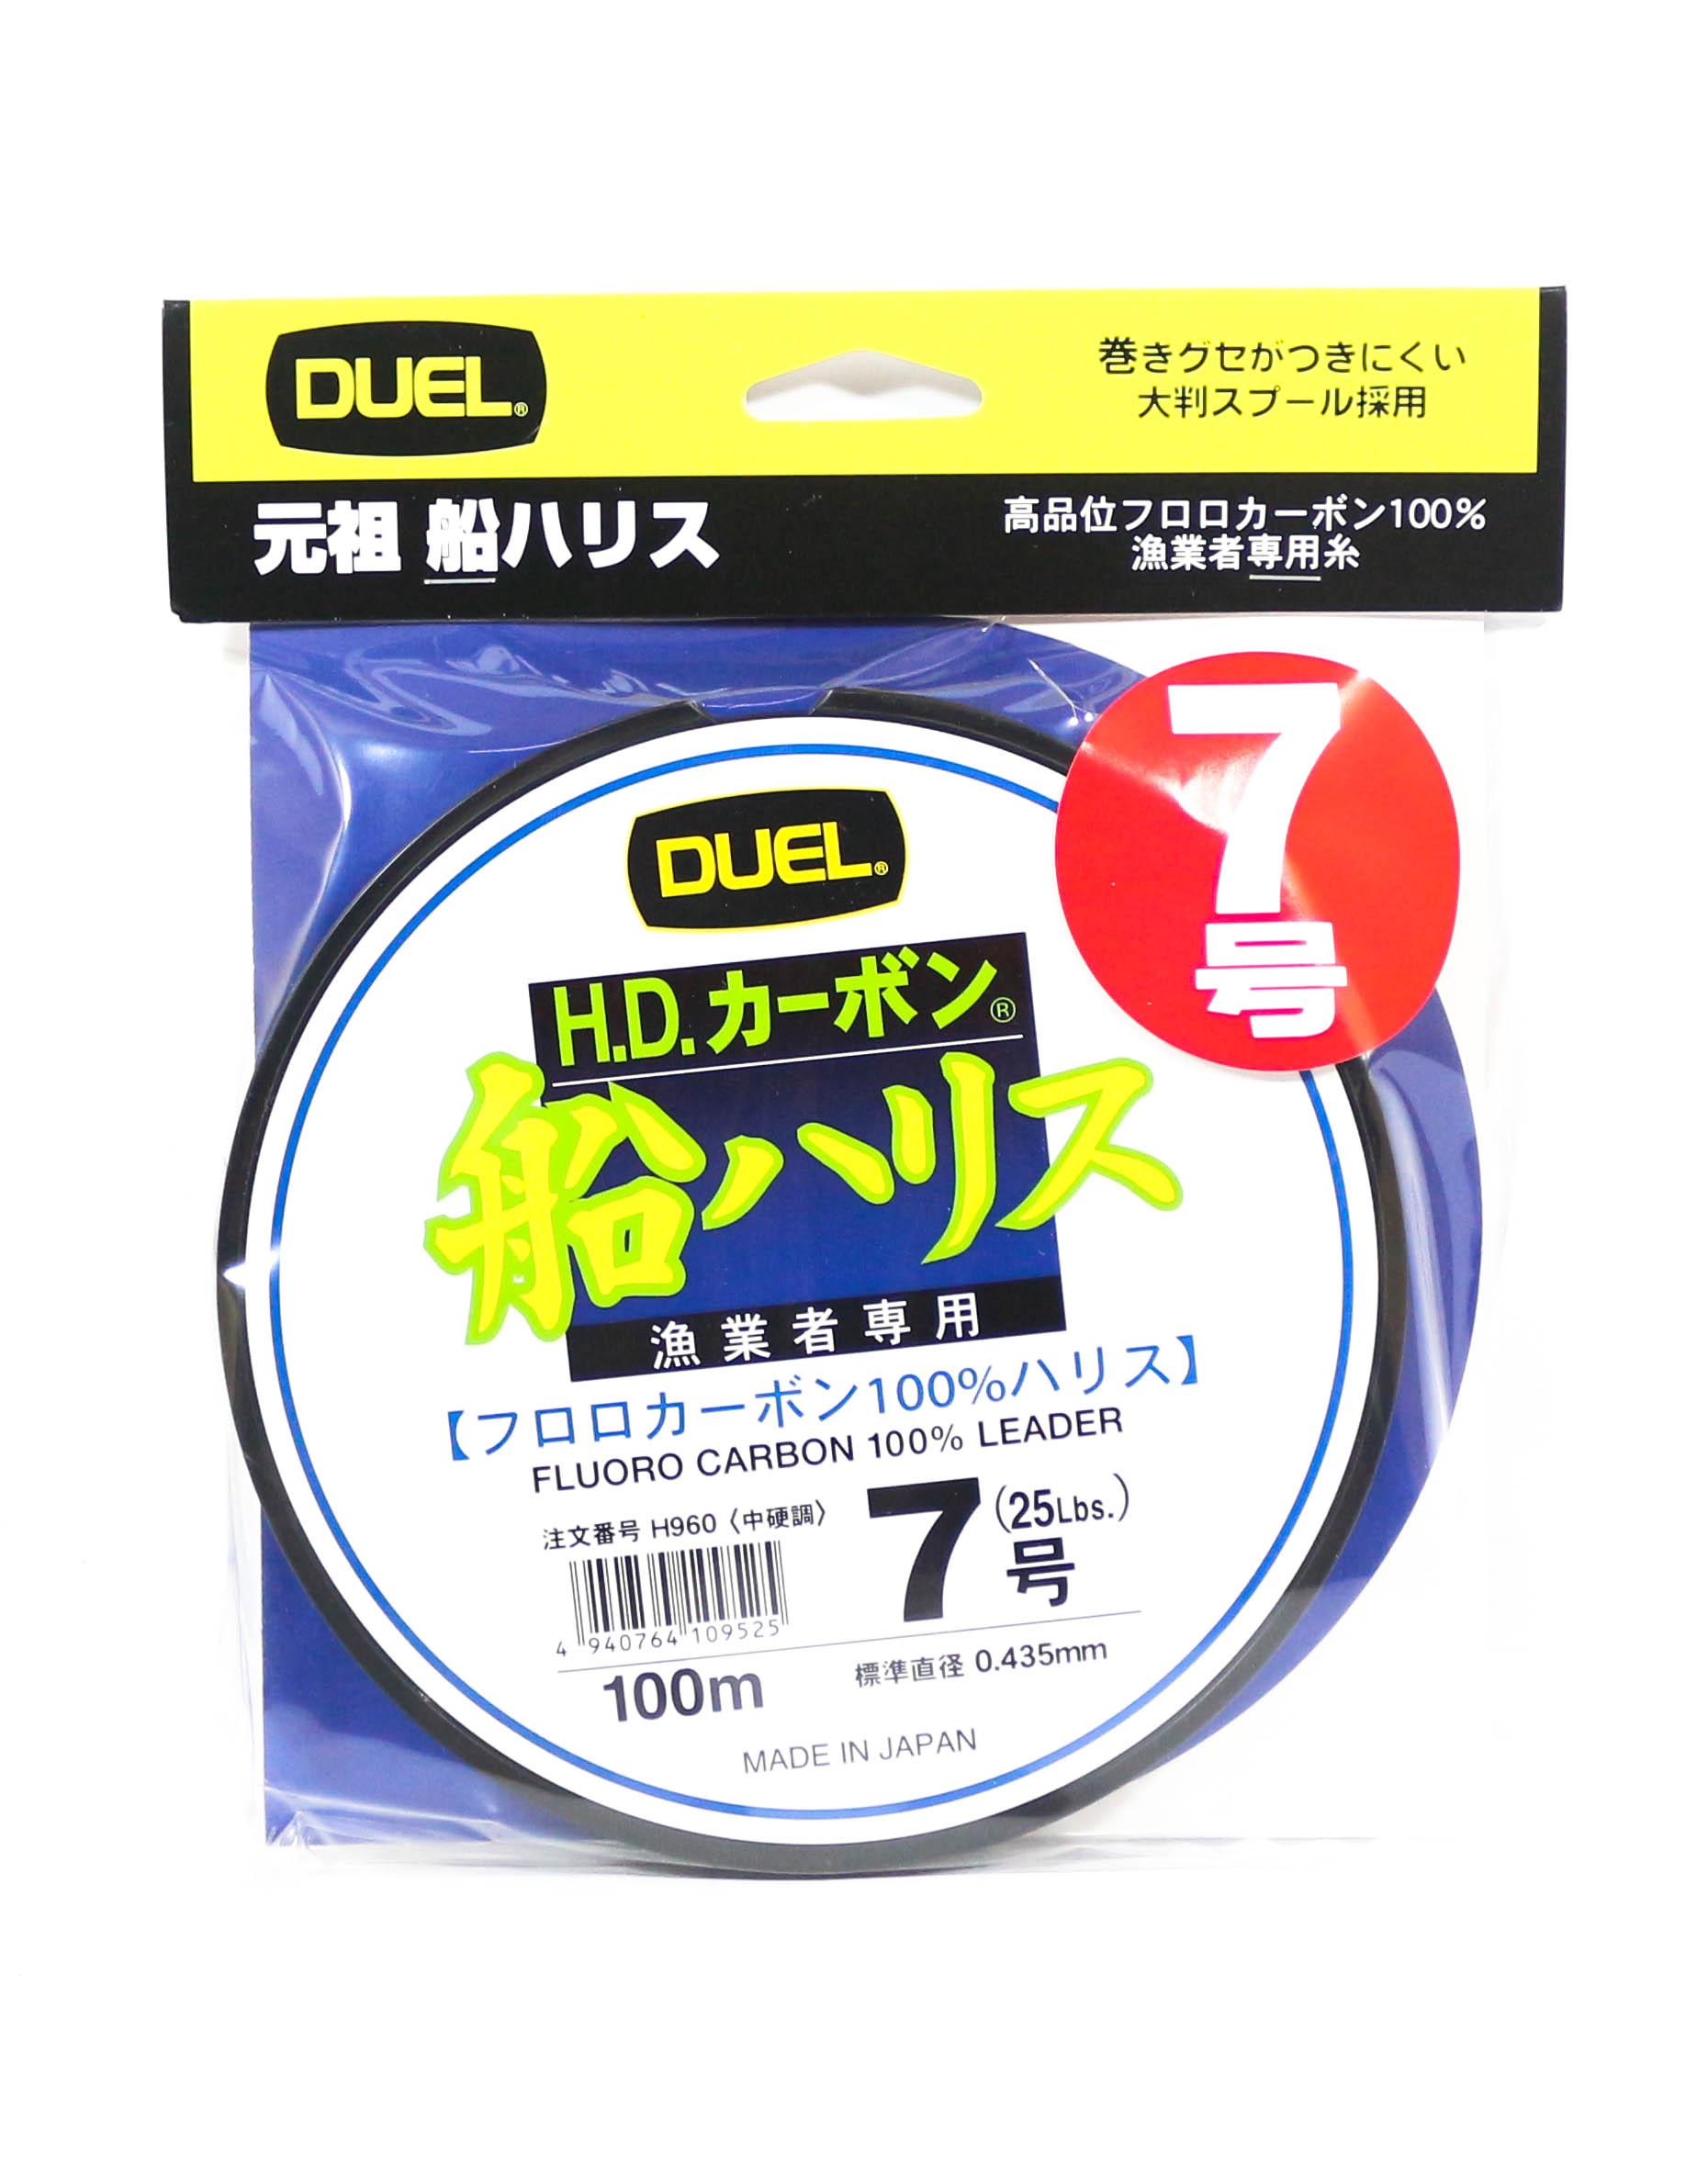 Yo Zuri Duel Fune Leader Fluorocarbon 100m Size 7 25lb 0.435mm H960 (9525)